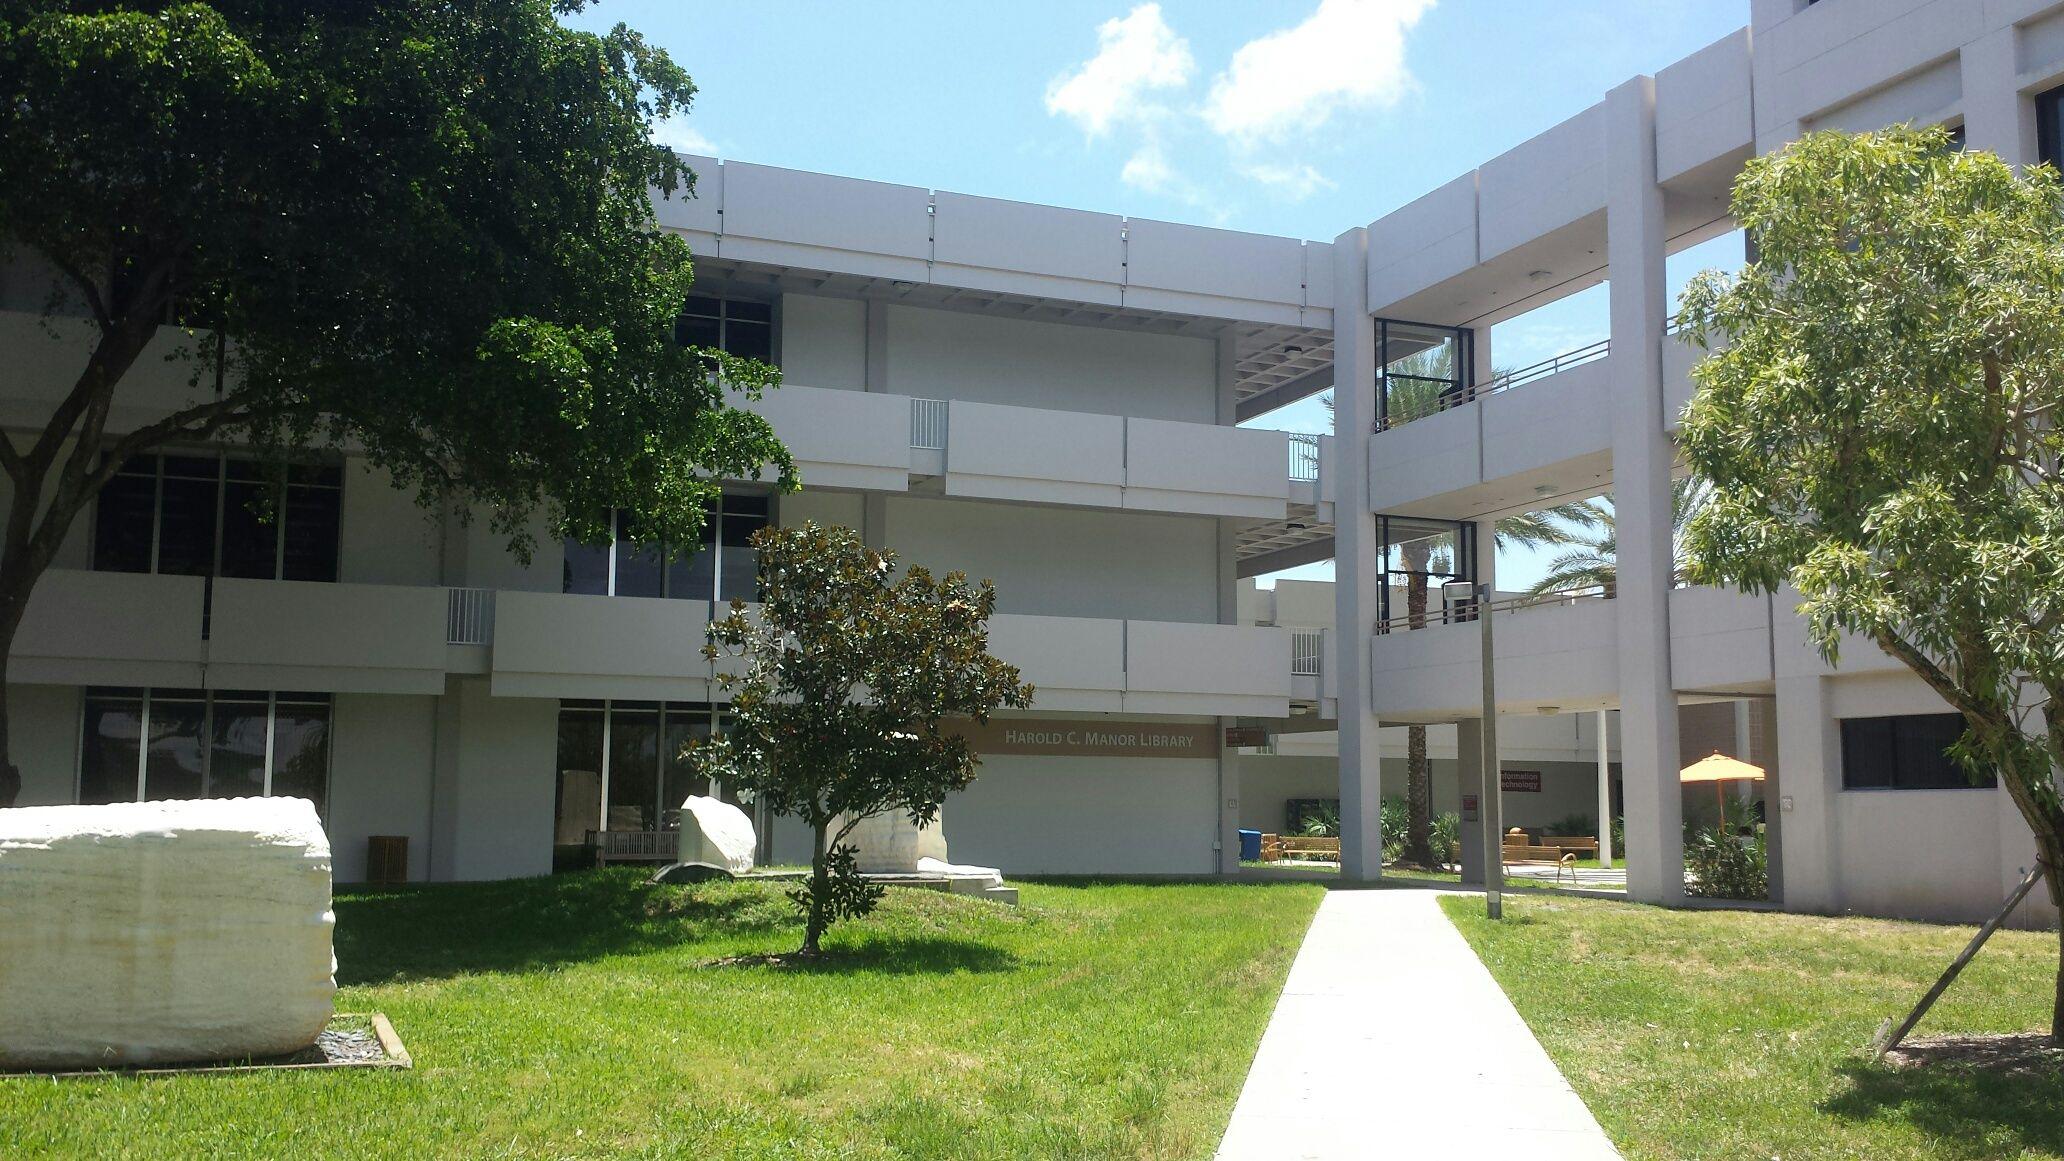 10d0298596c3894368b3d6f9798d4e17 - Middle Schools In Palm Beach Gardens